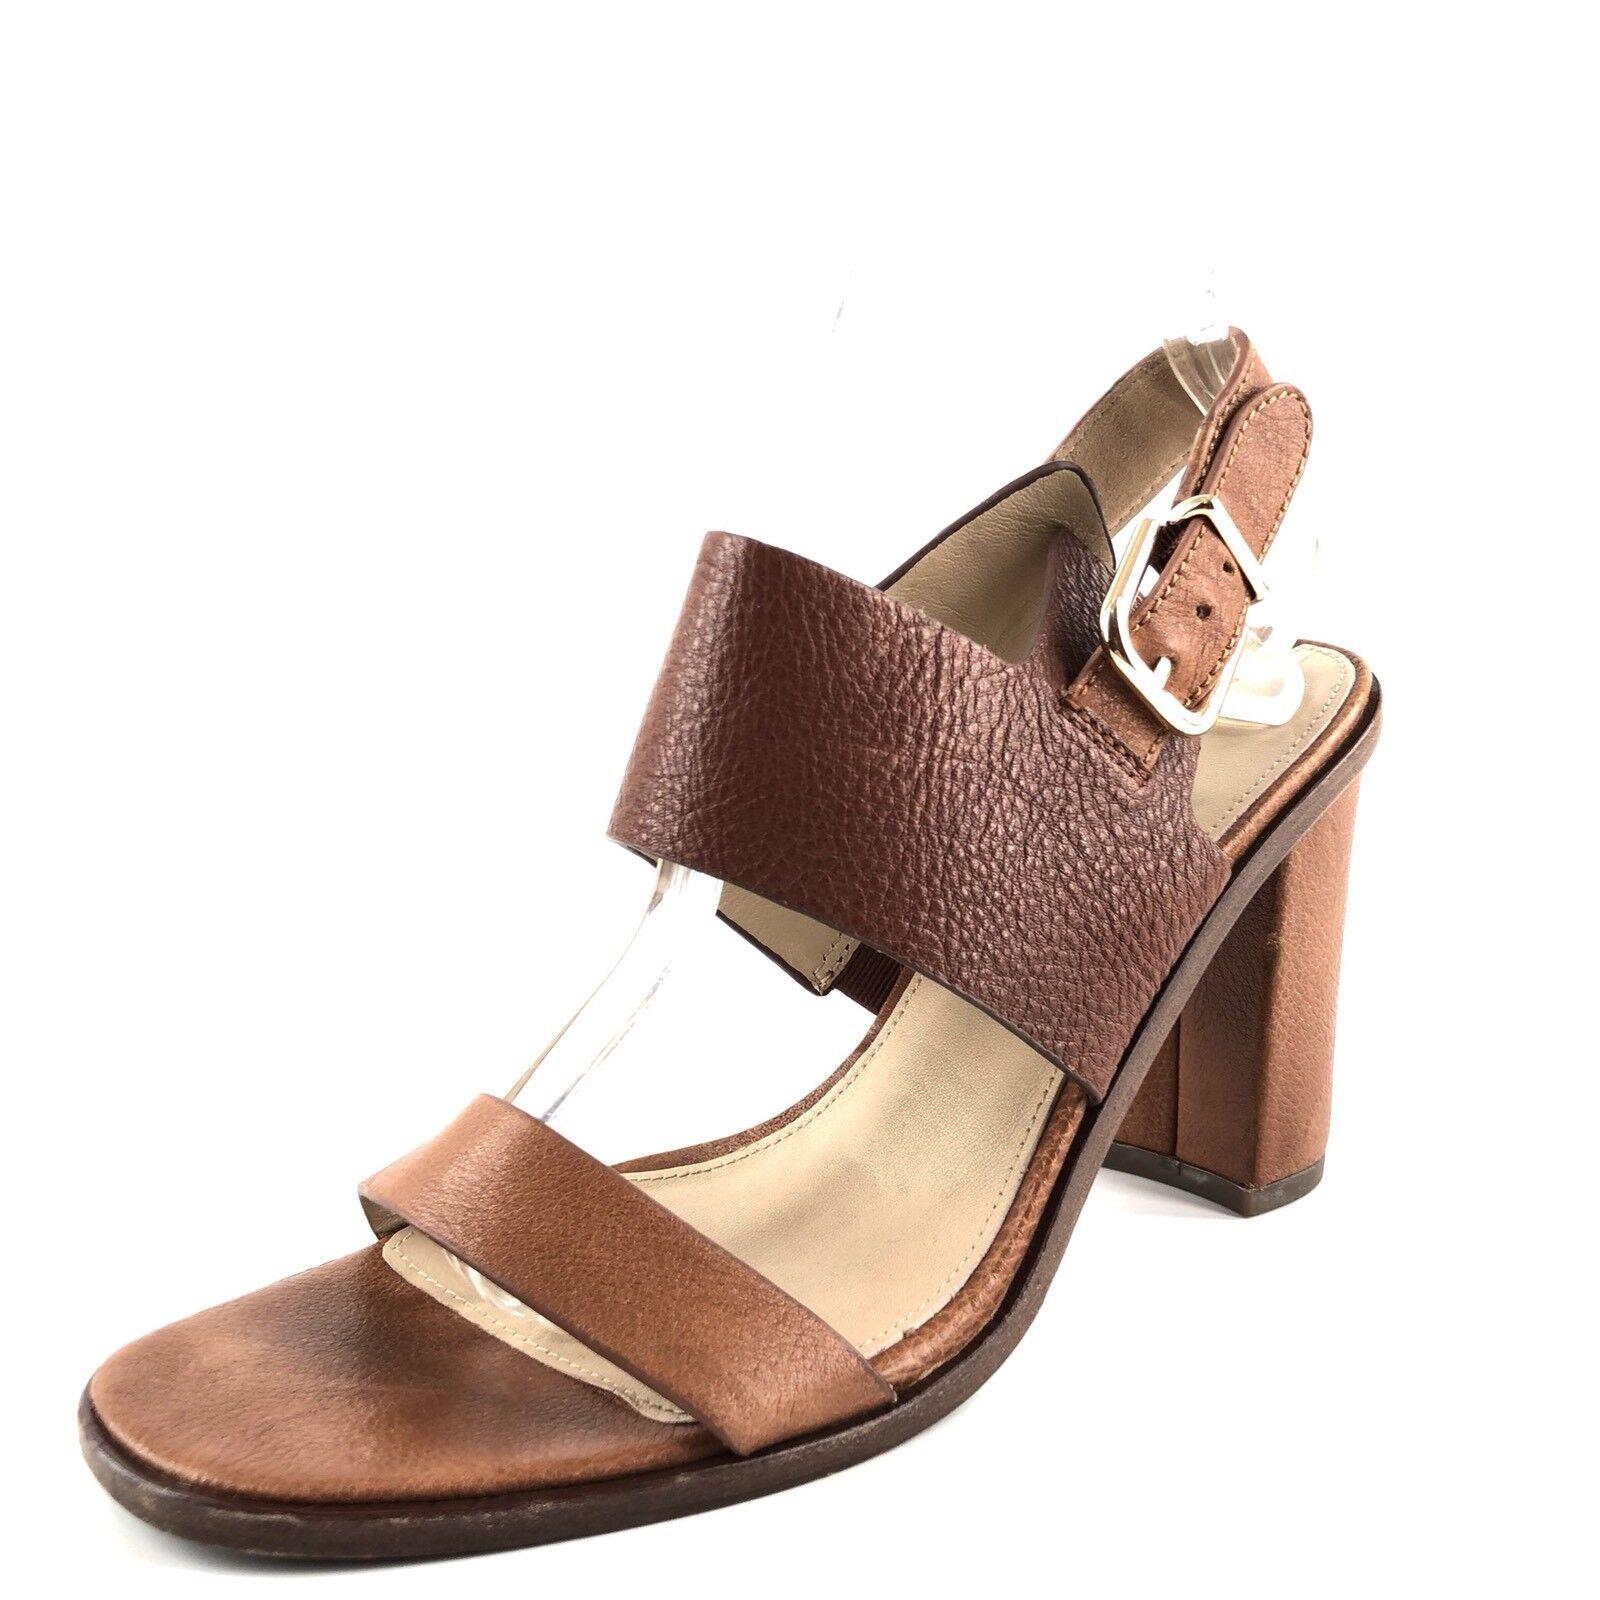 Via Spiga marron Leather Open Toe Slingback Sandals femmes's Taille 7 M